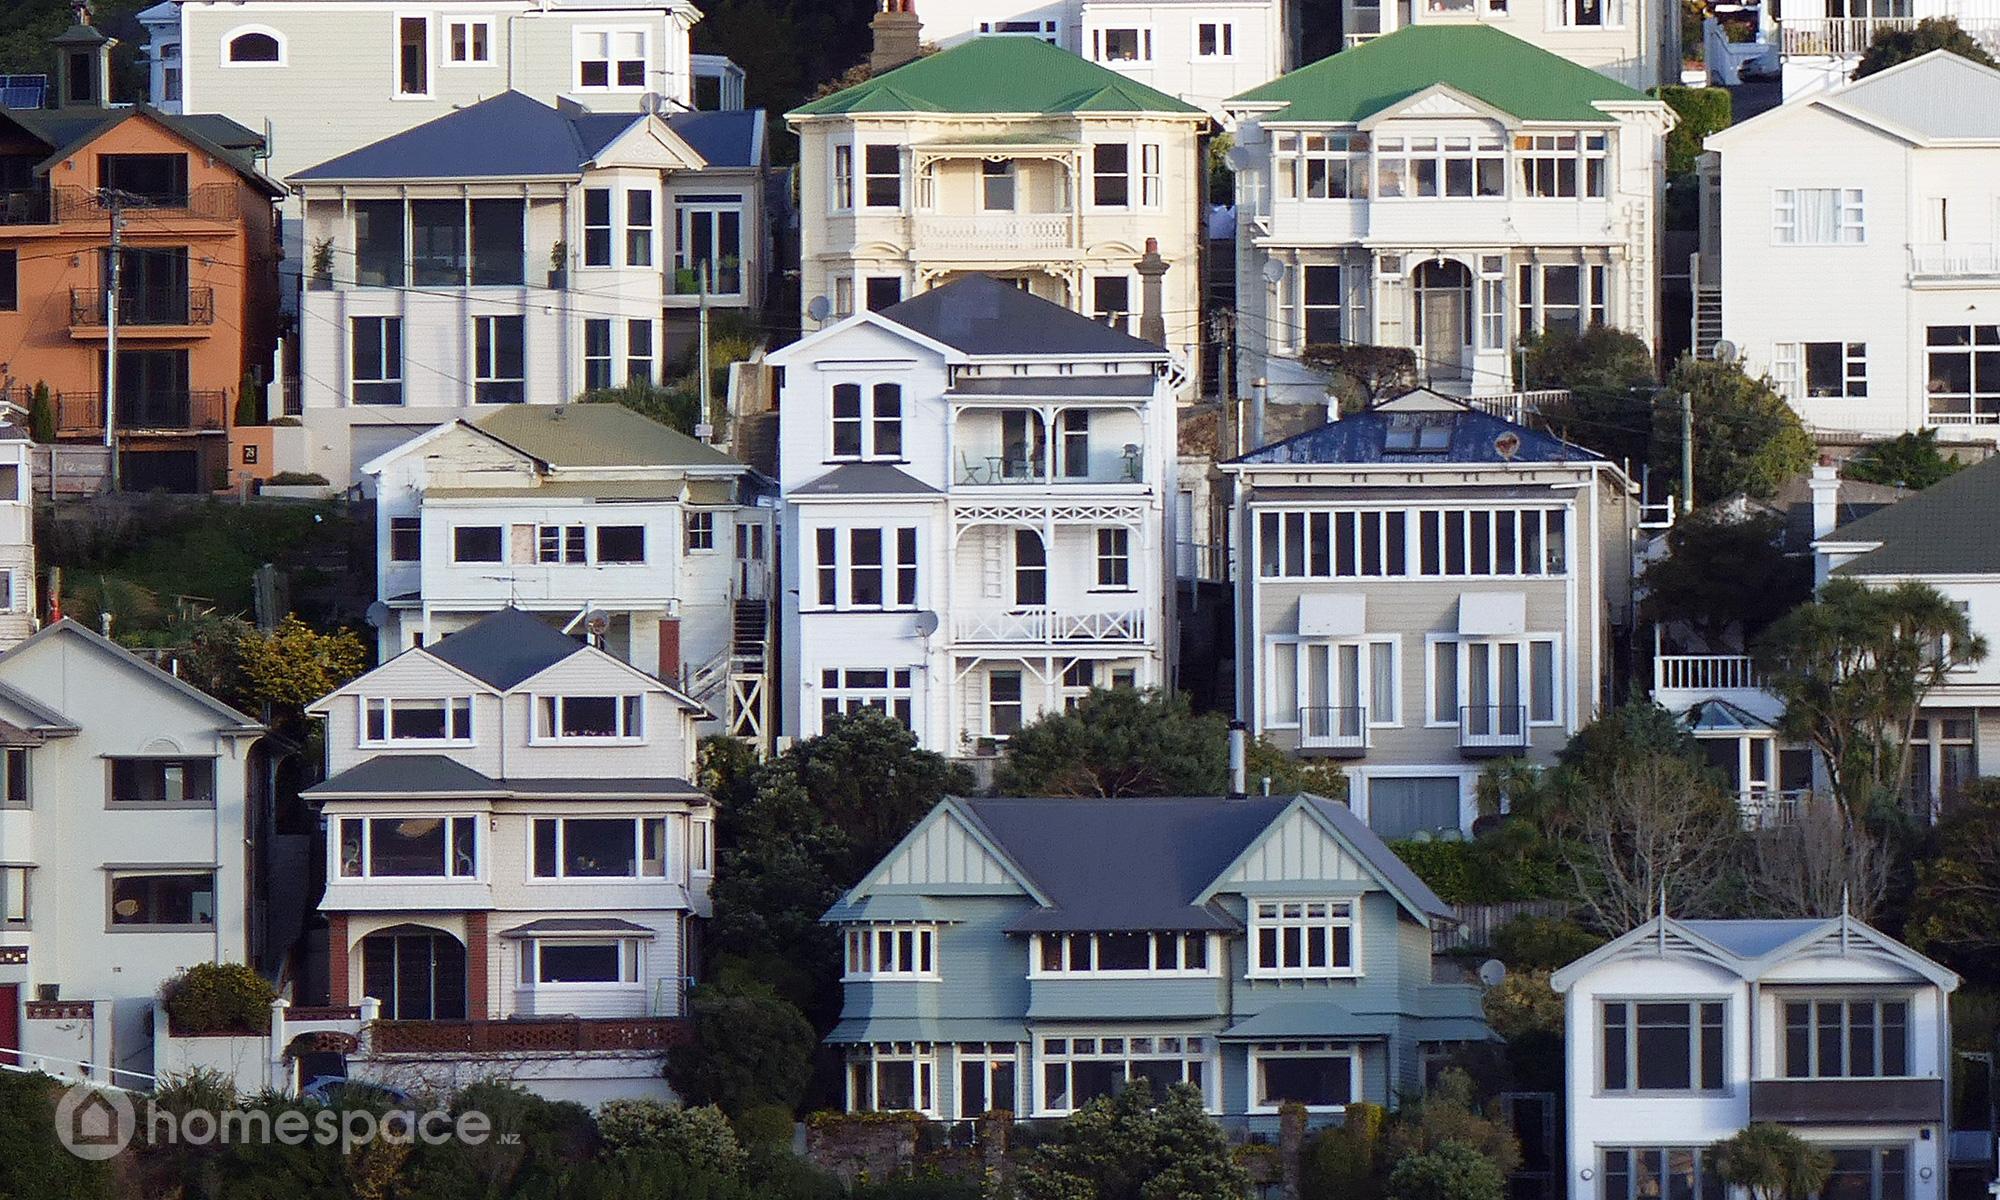 NZ House Value Estimate Websites